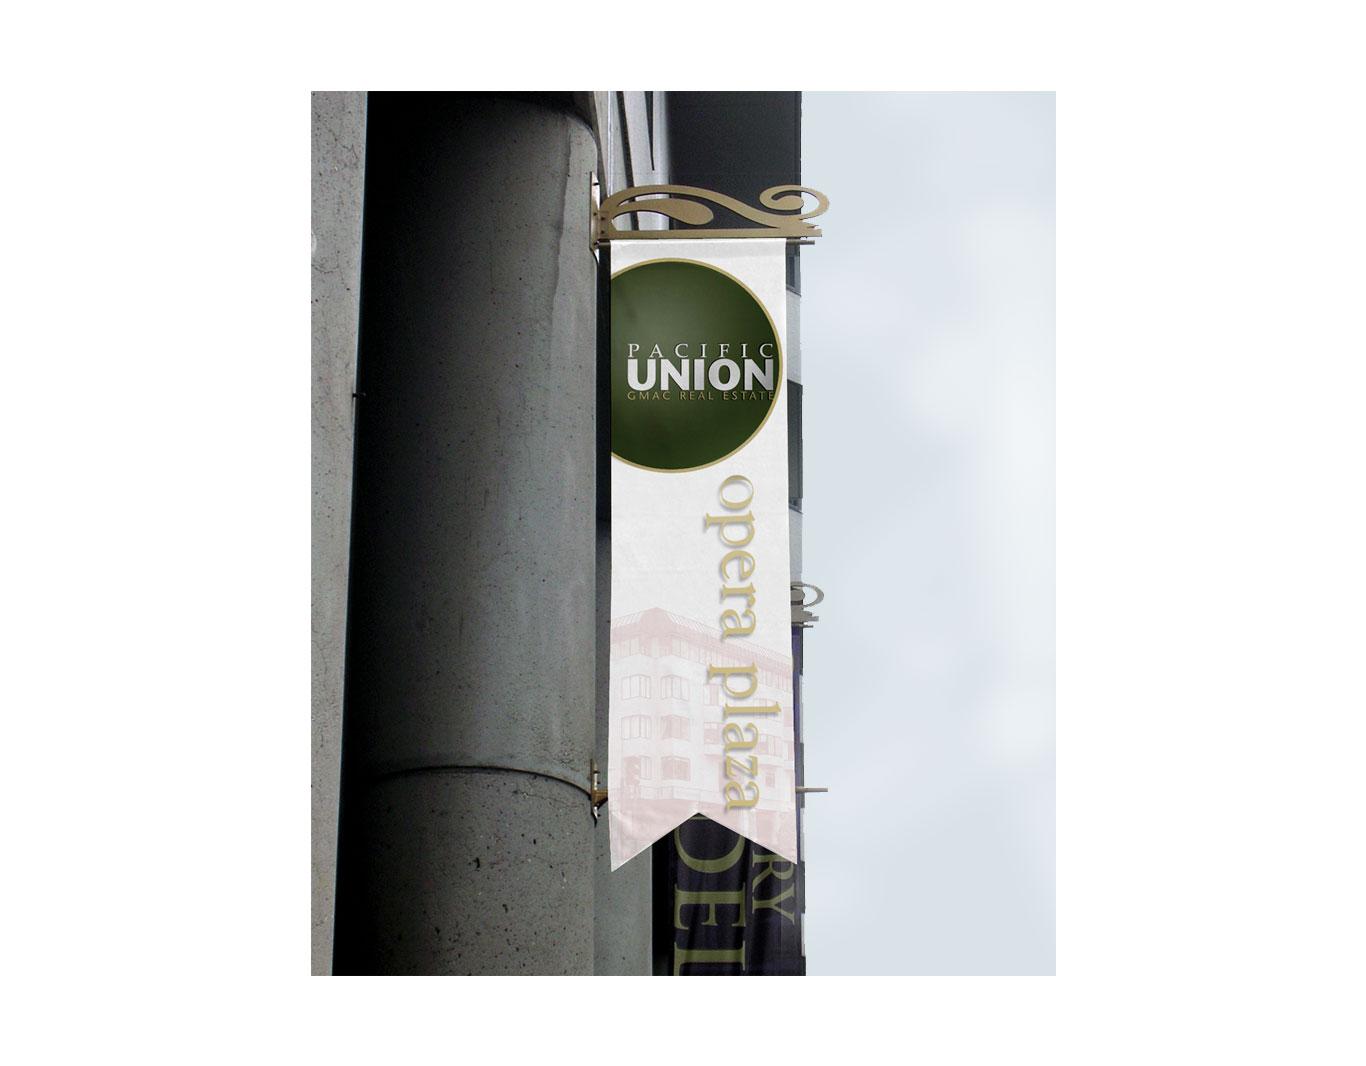 Exterior- Pacific Union